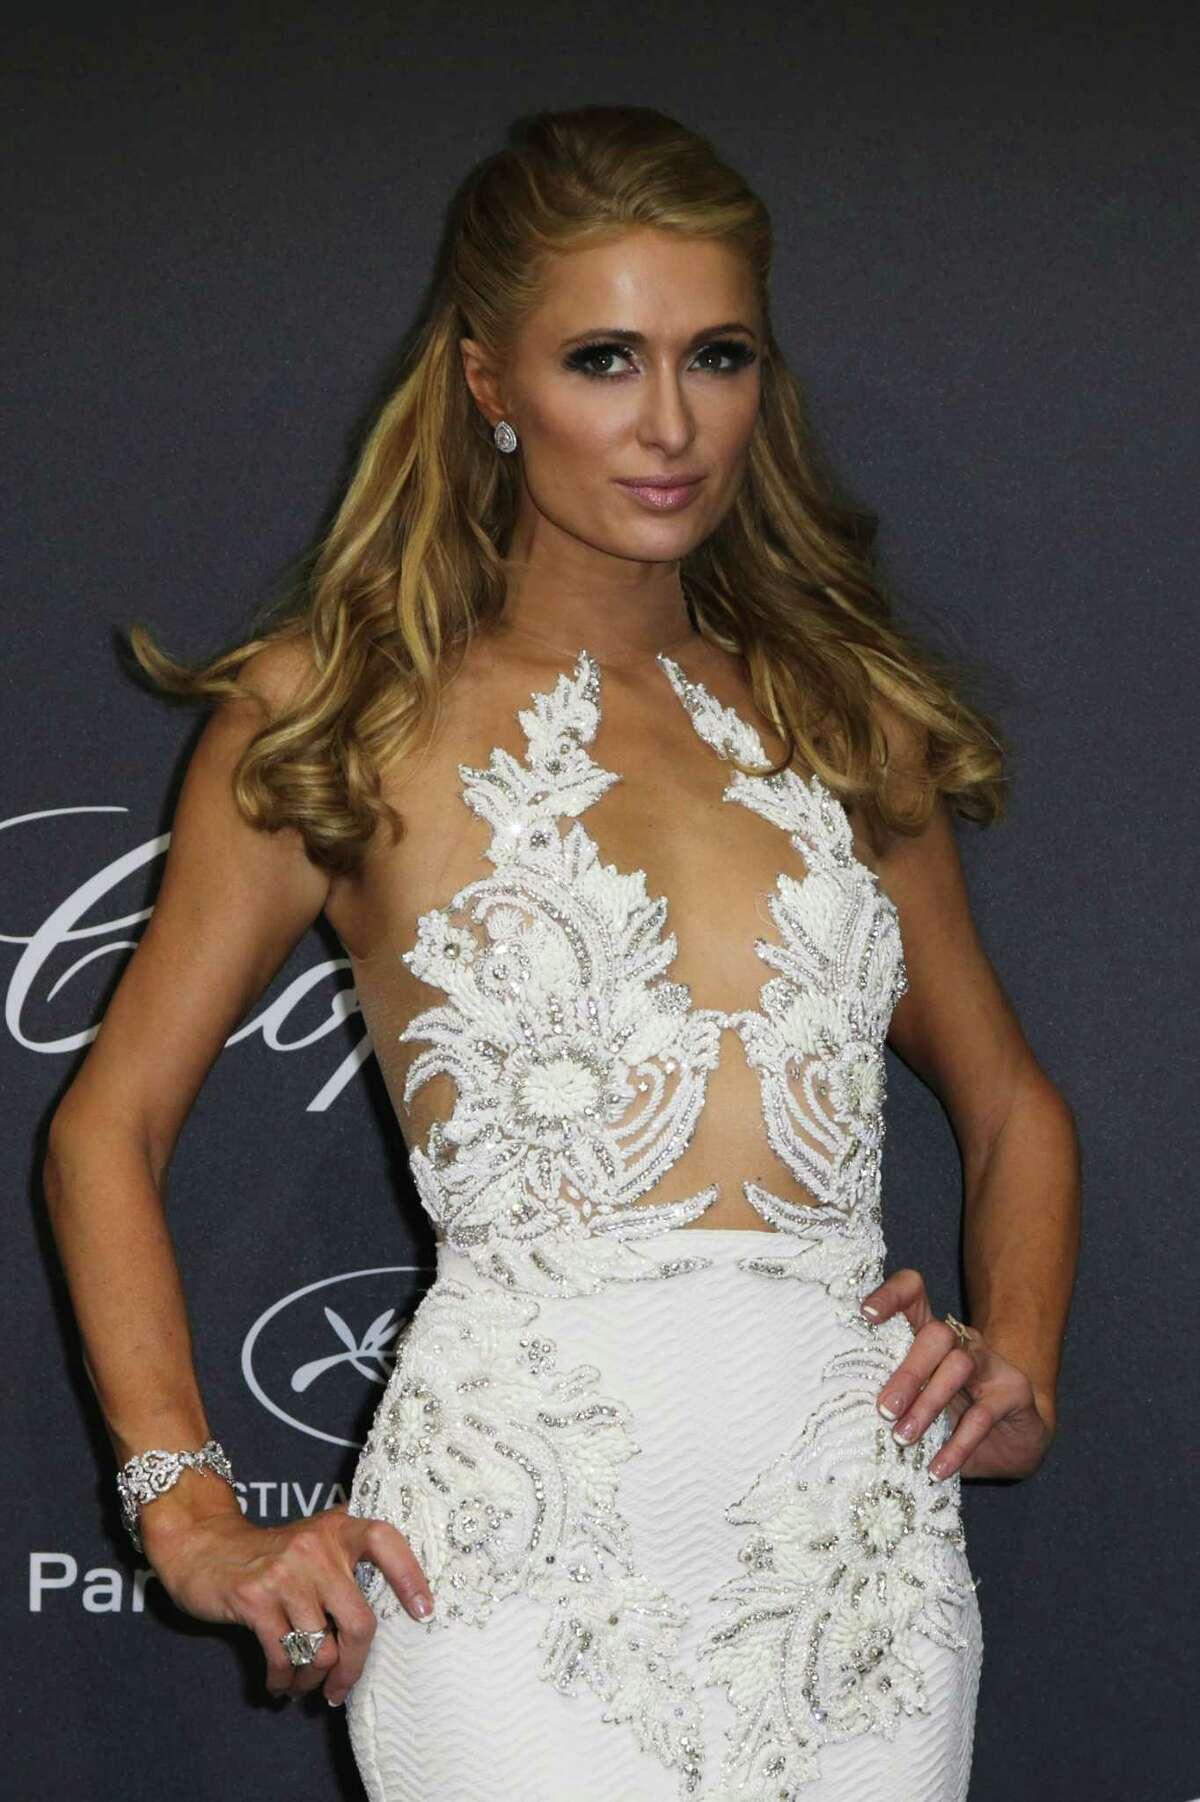 TV celebrity Paris Hilton37